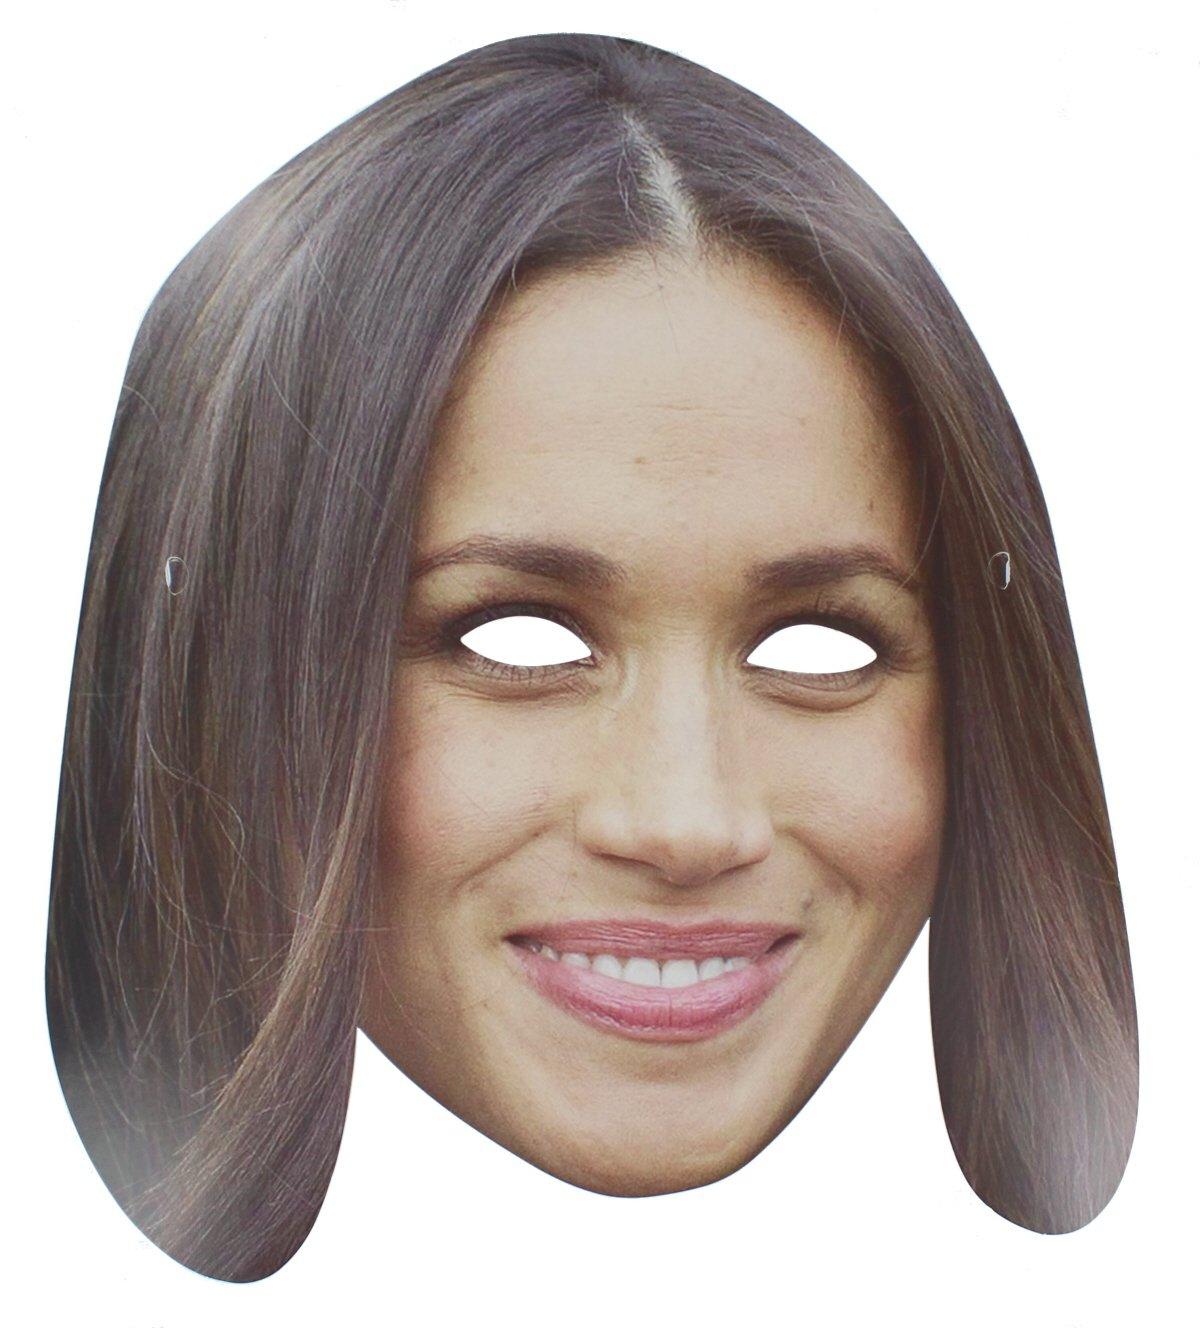 Meghan Markle Royal Wedding Celebrity Card Face Mask Street Party Accessory